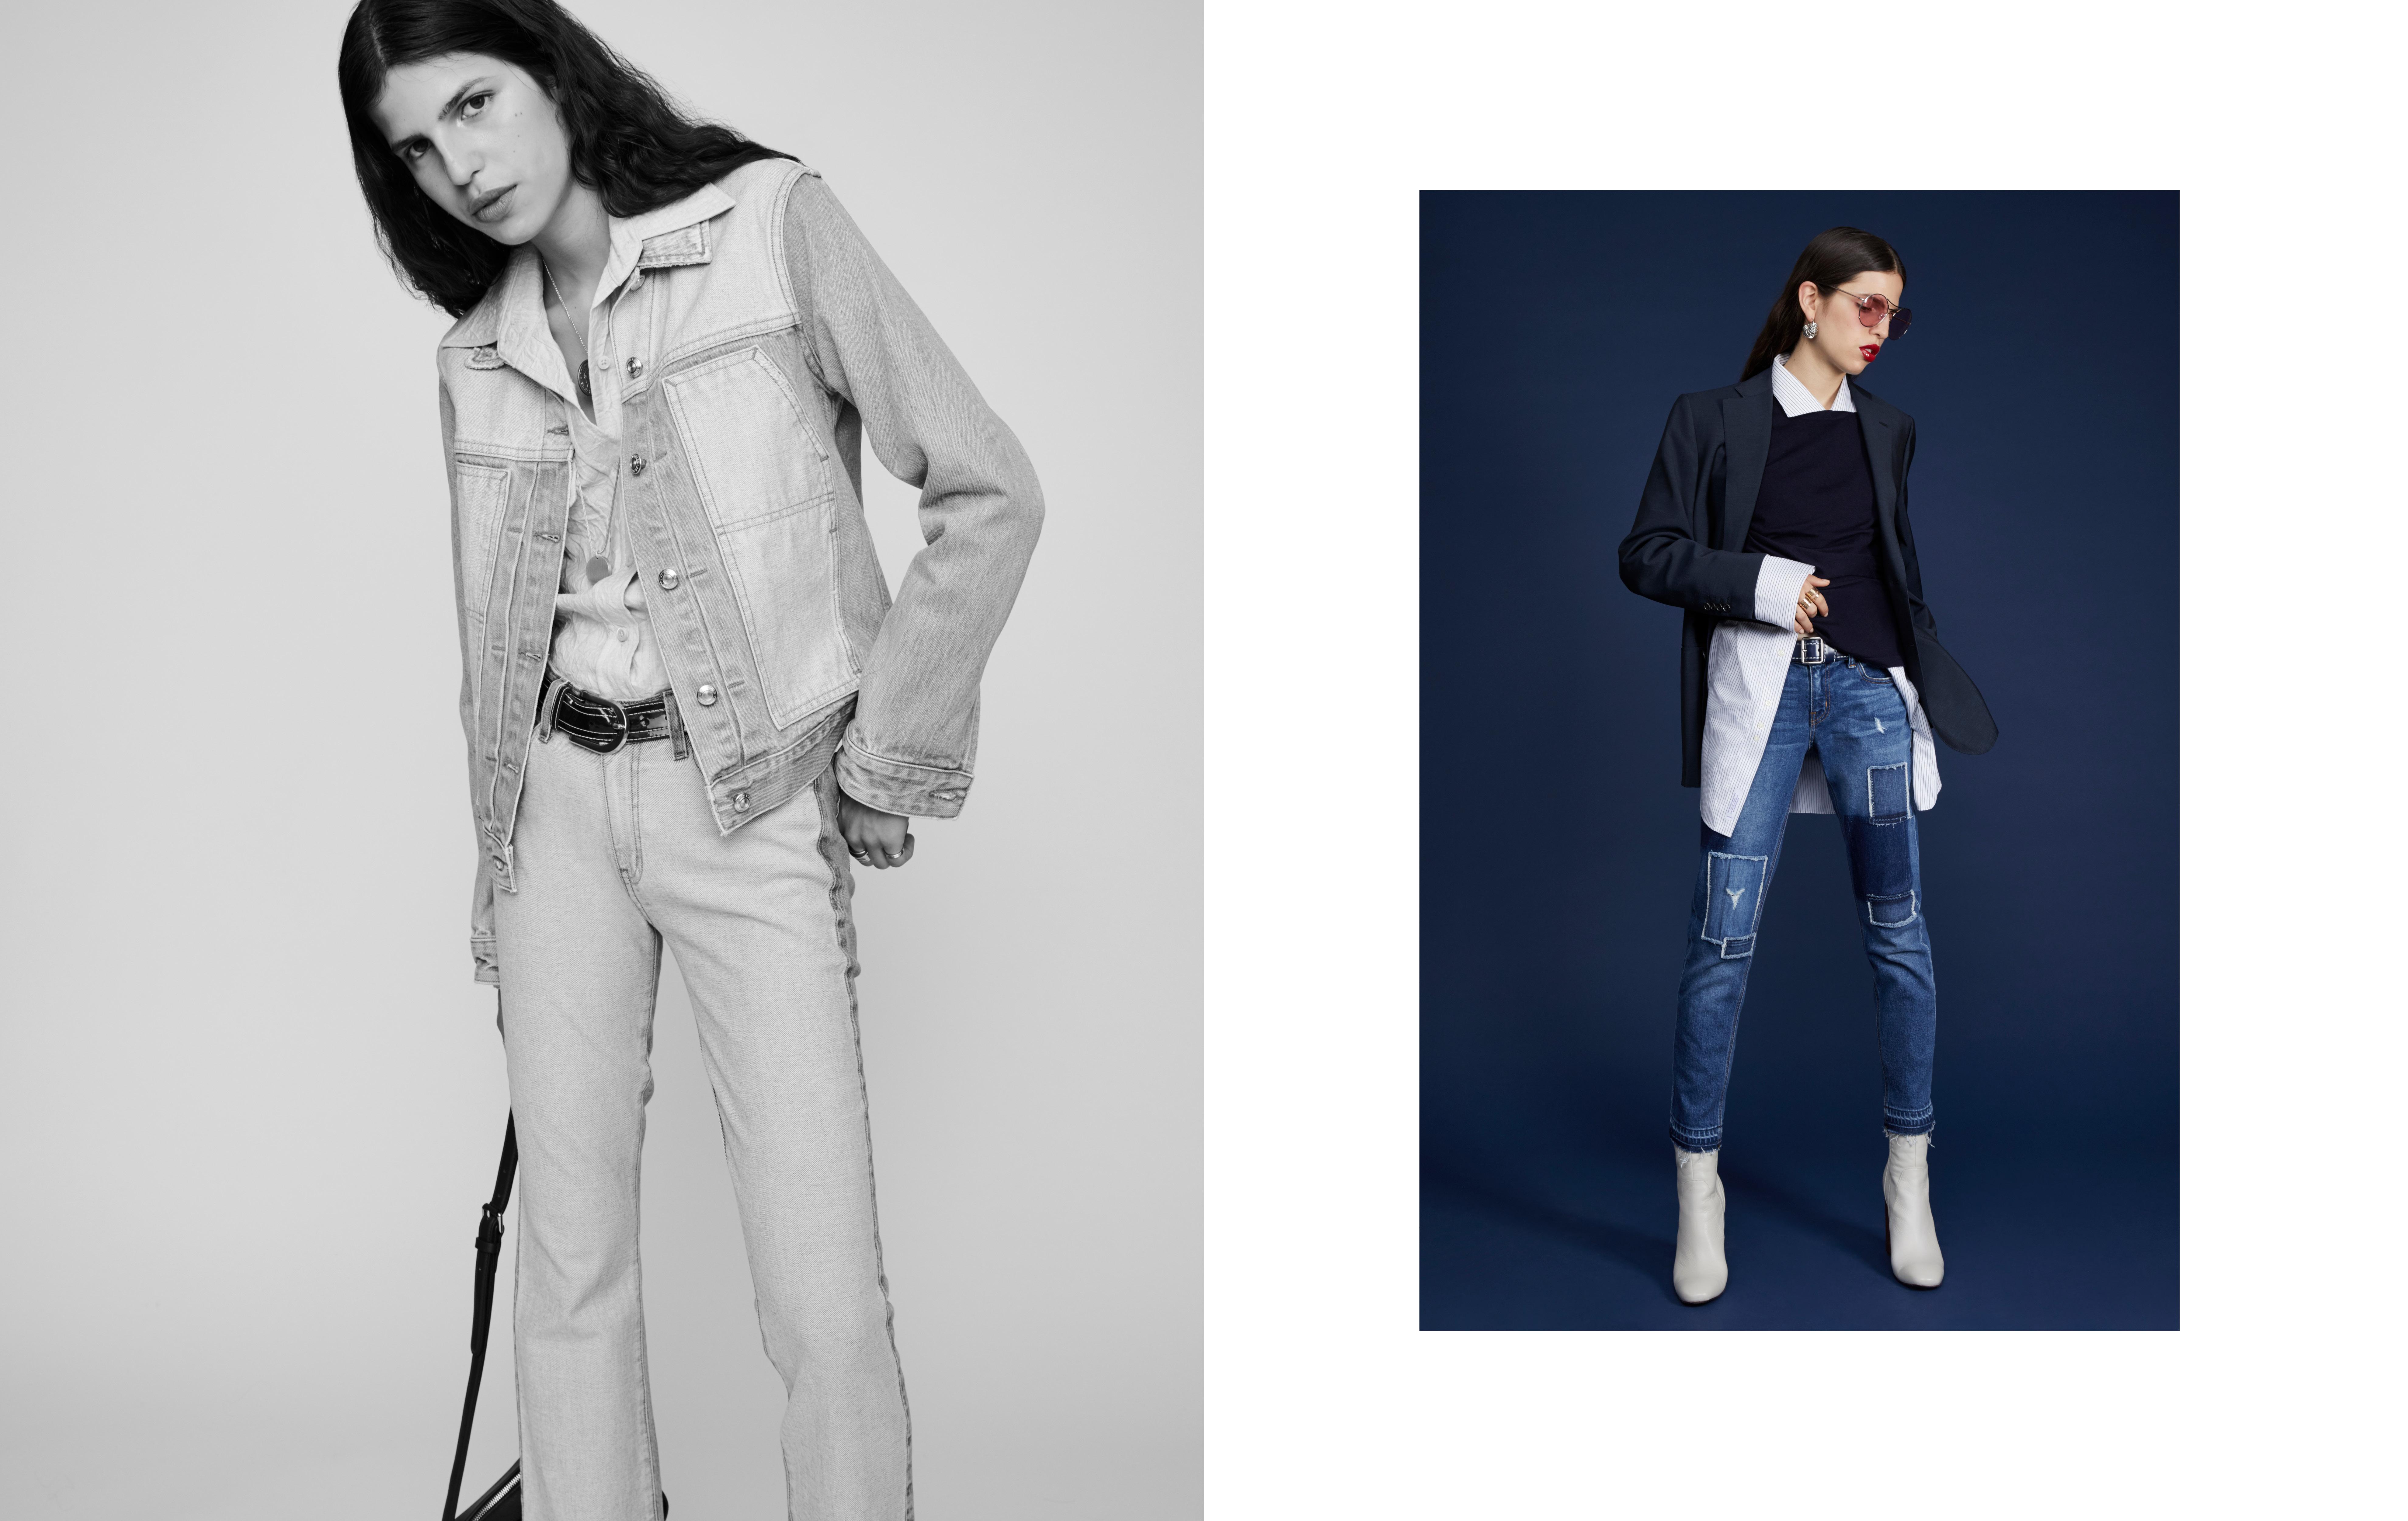 Fashion campaign for Derek Lam denim collection.